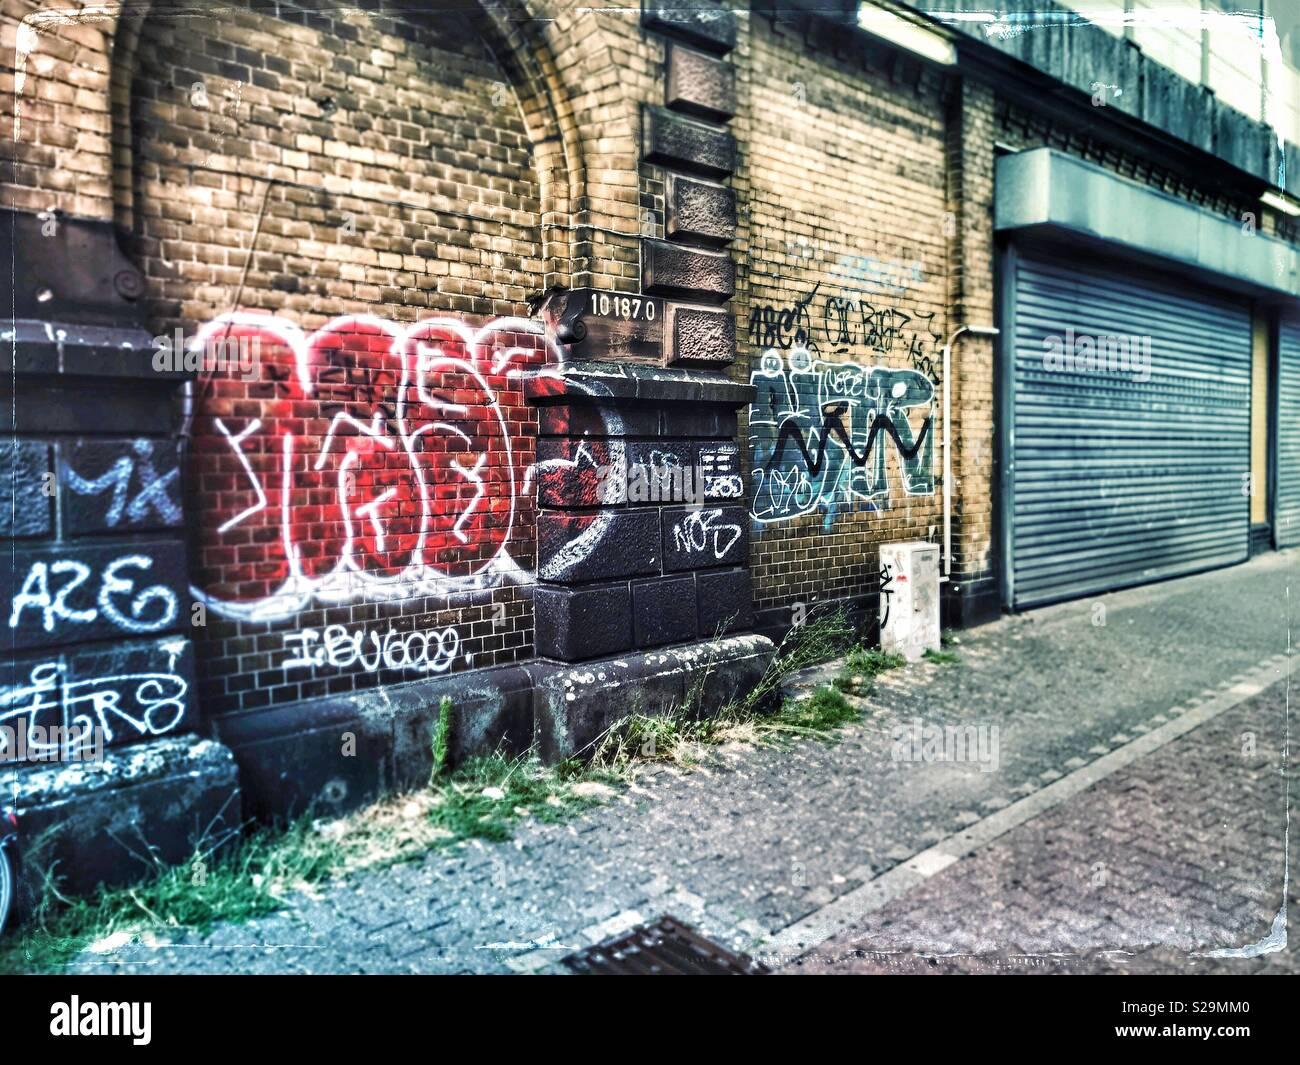 Graffiti in Düsseldorf - Deutschland Stockbild